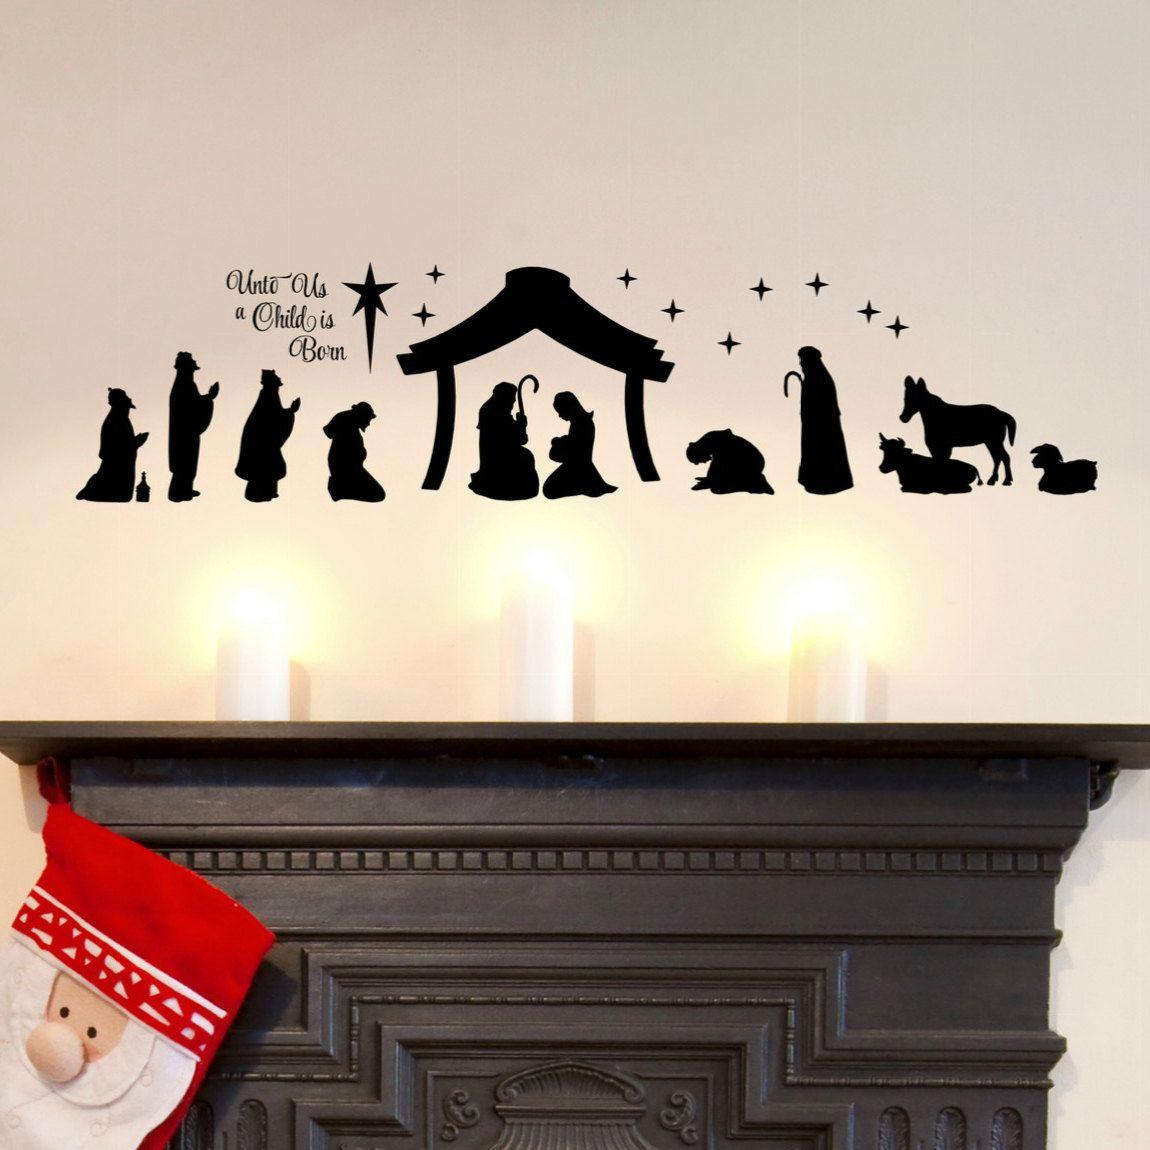 Decal Sticker Wall Art BELIEVE NATIVITY SCENE Christmas Vinyl X-Mas Window